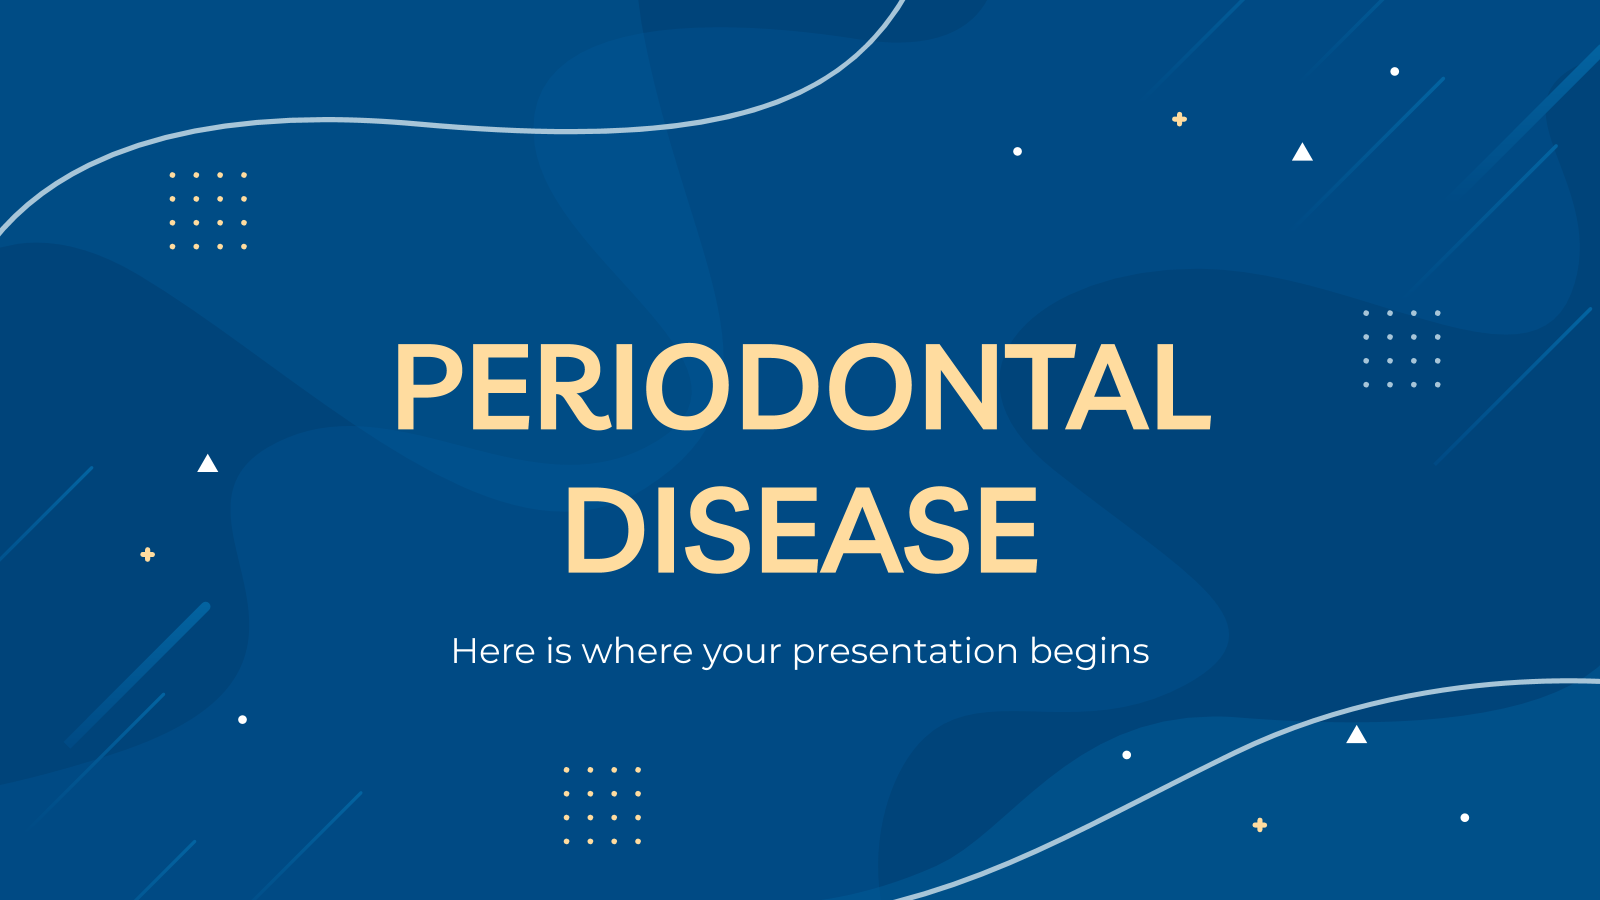 Periodontal Disease presentation template